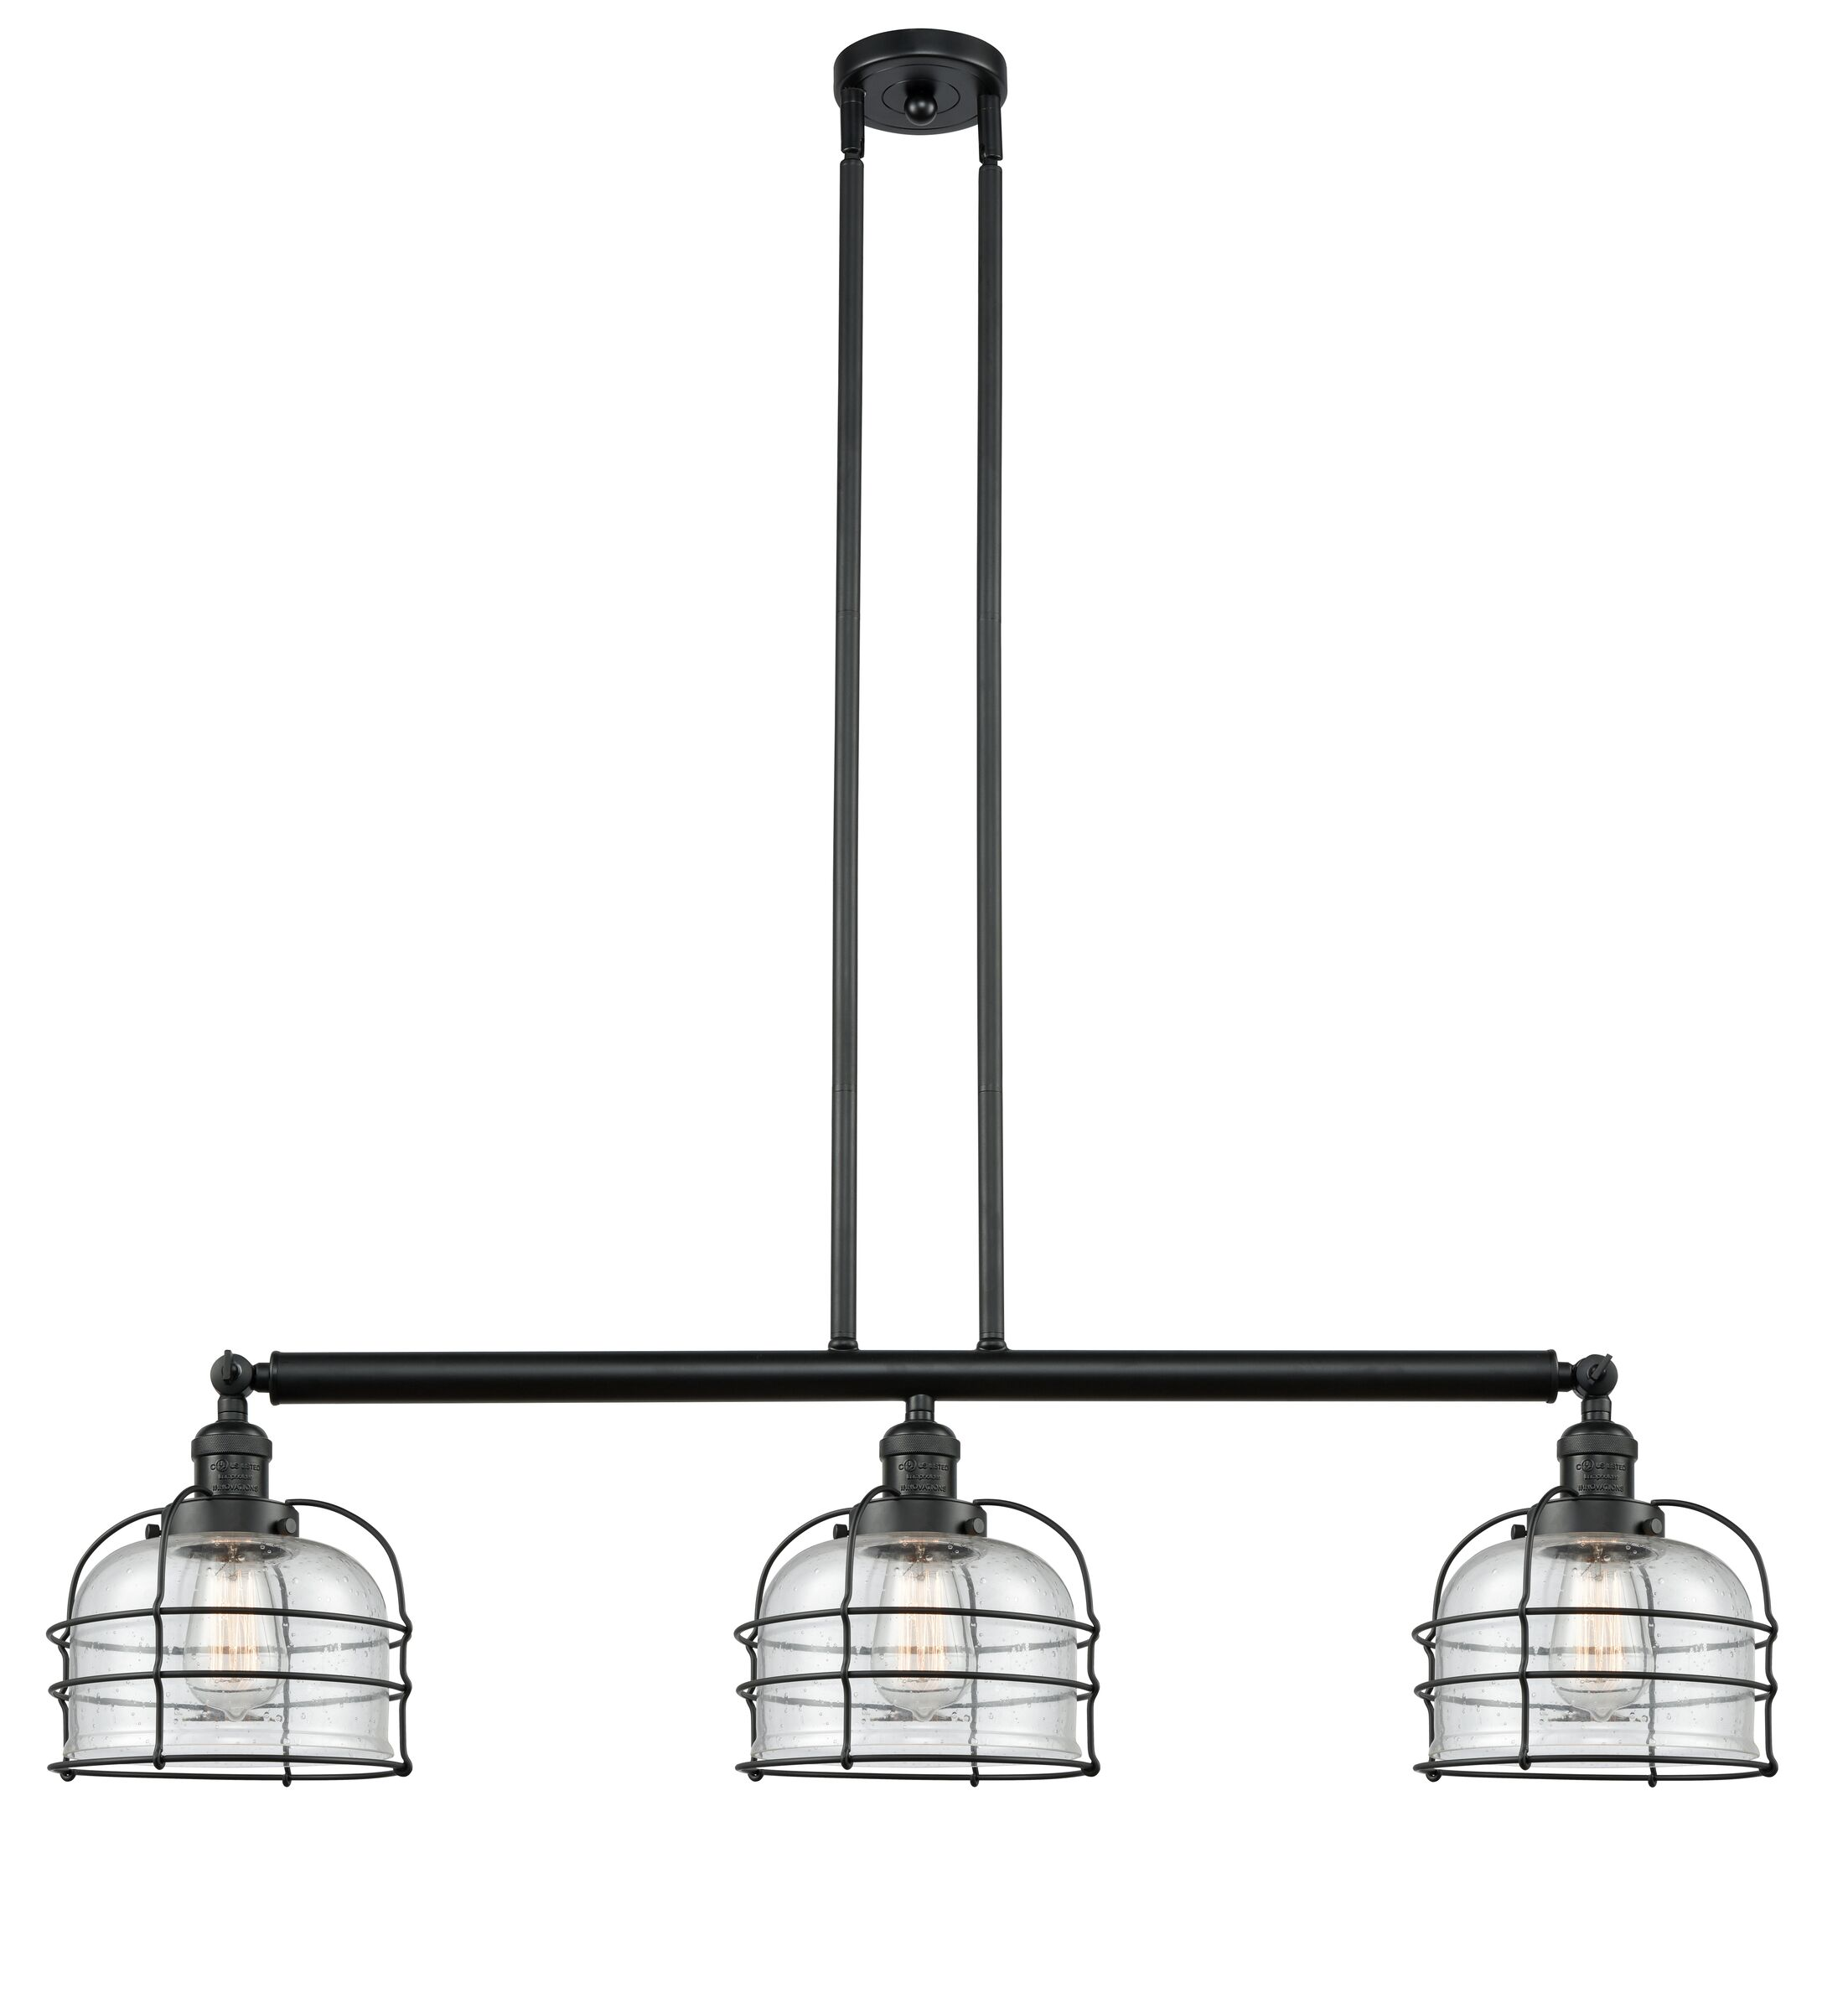 Mixon 3-Light Kitchen Island Pendant Bulb Type: LED, Shade Color: Seedy